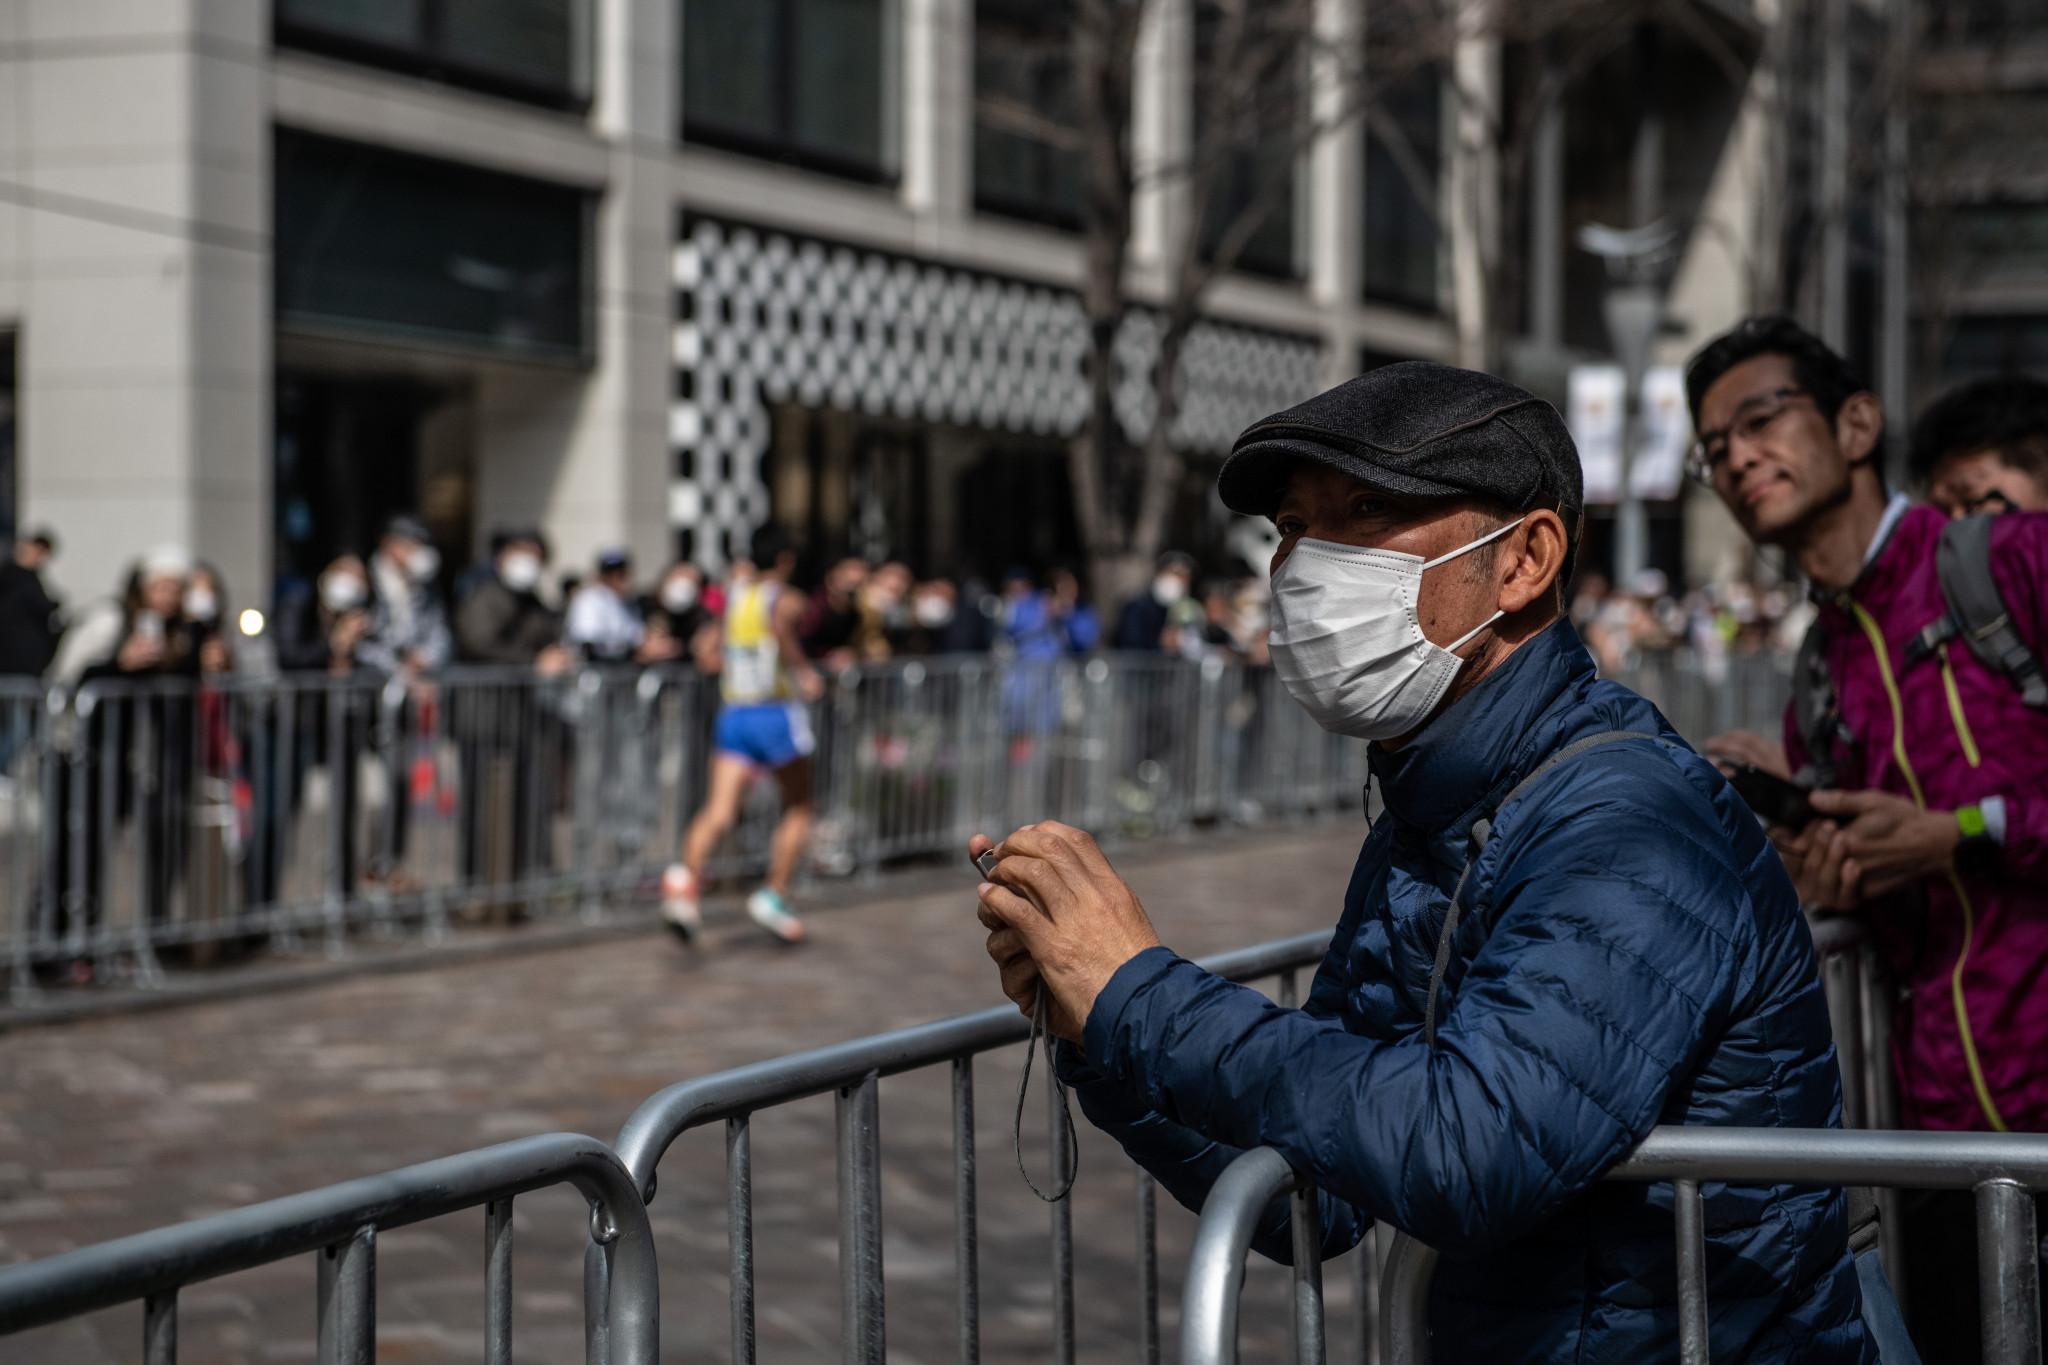 Study estimates $6.7 billion lost from cancellation of Japanese marathons